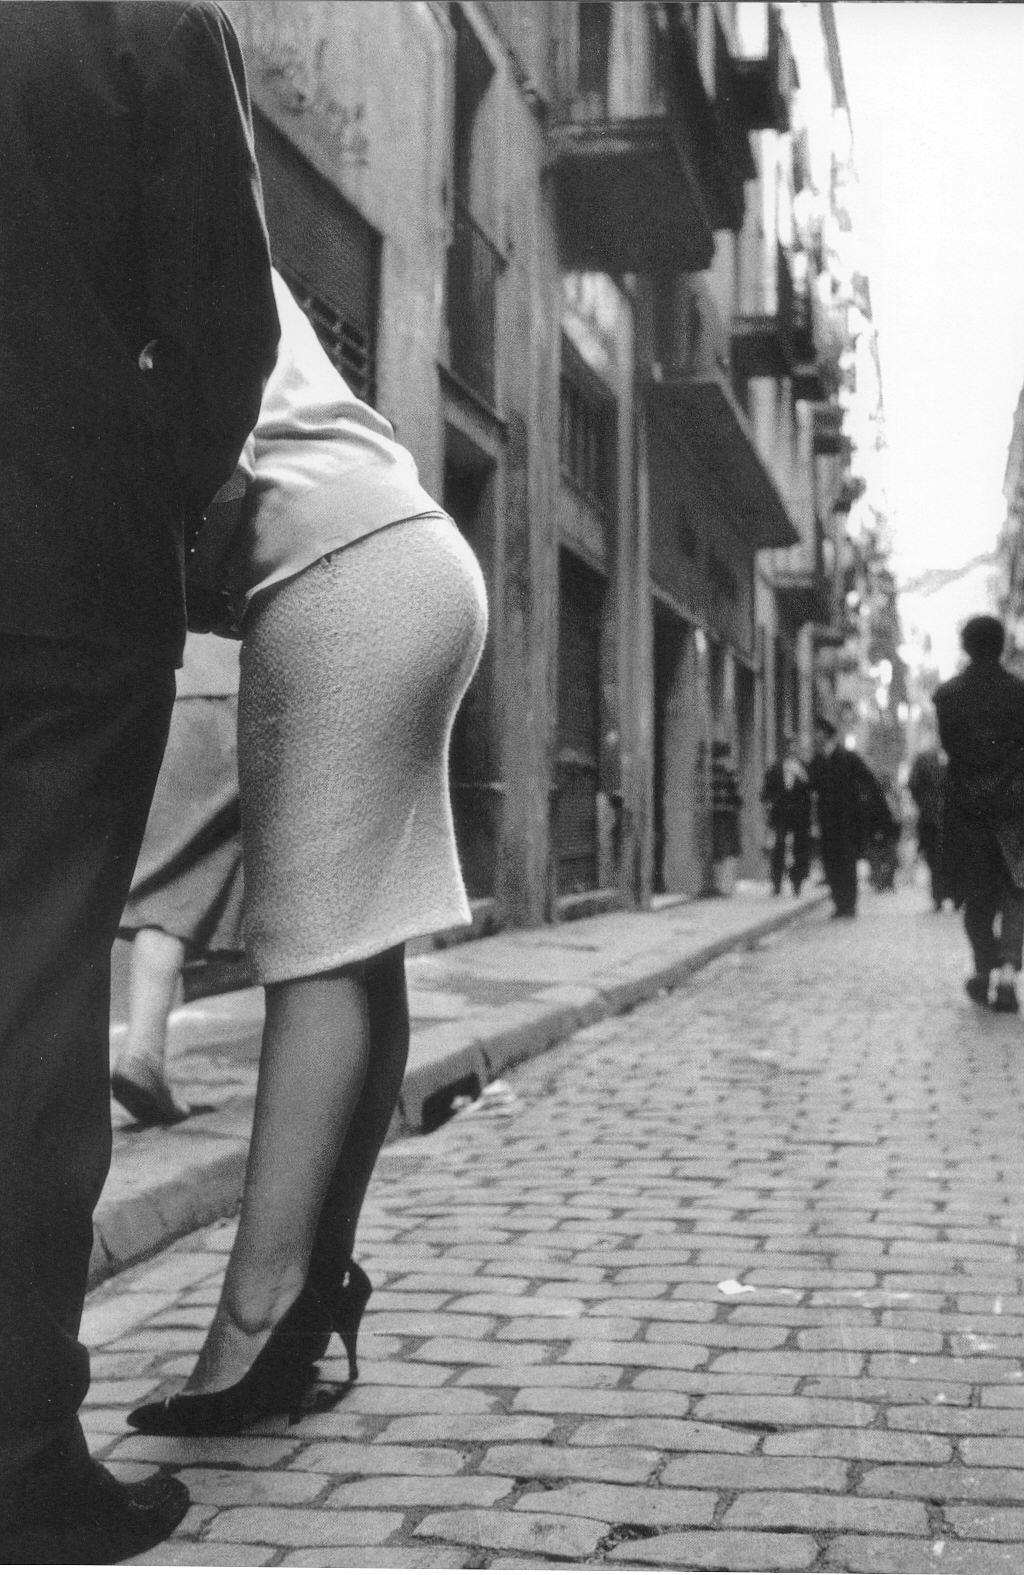 prstituta prostitutas en sant joan despi